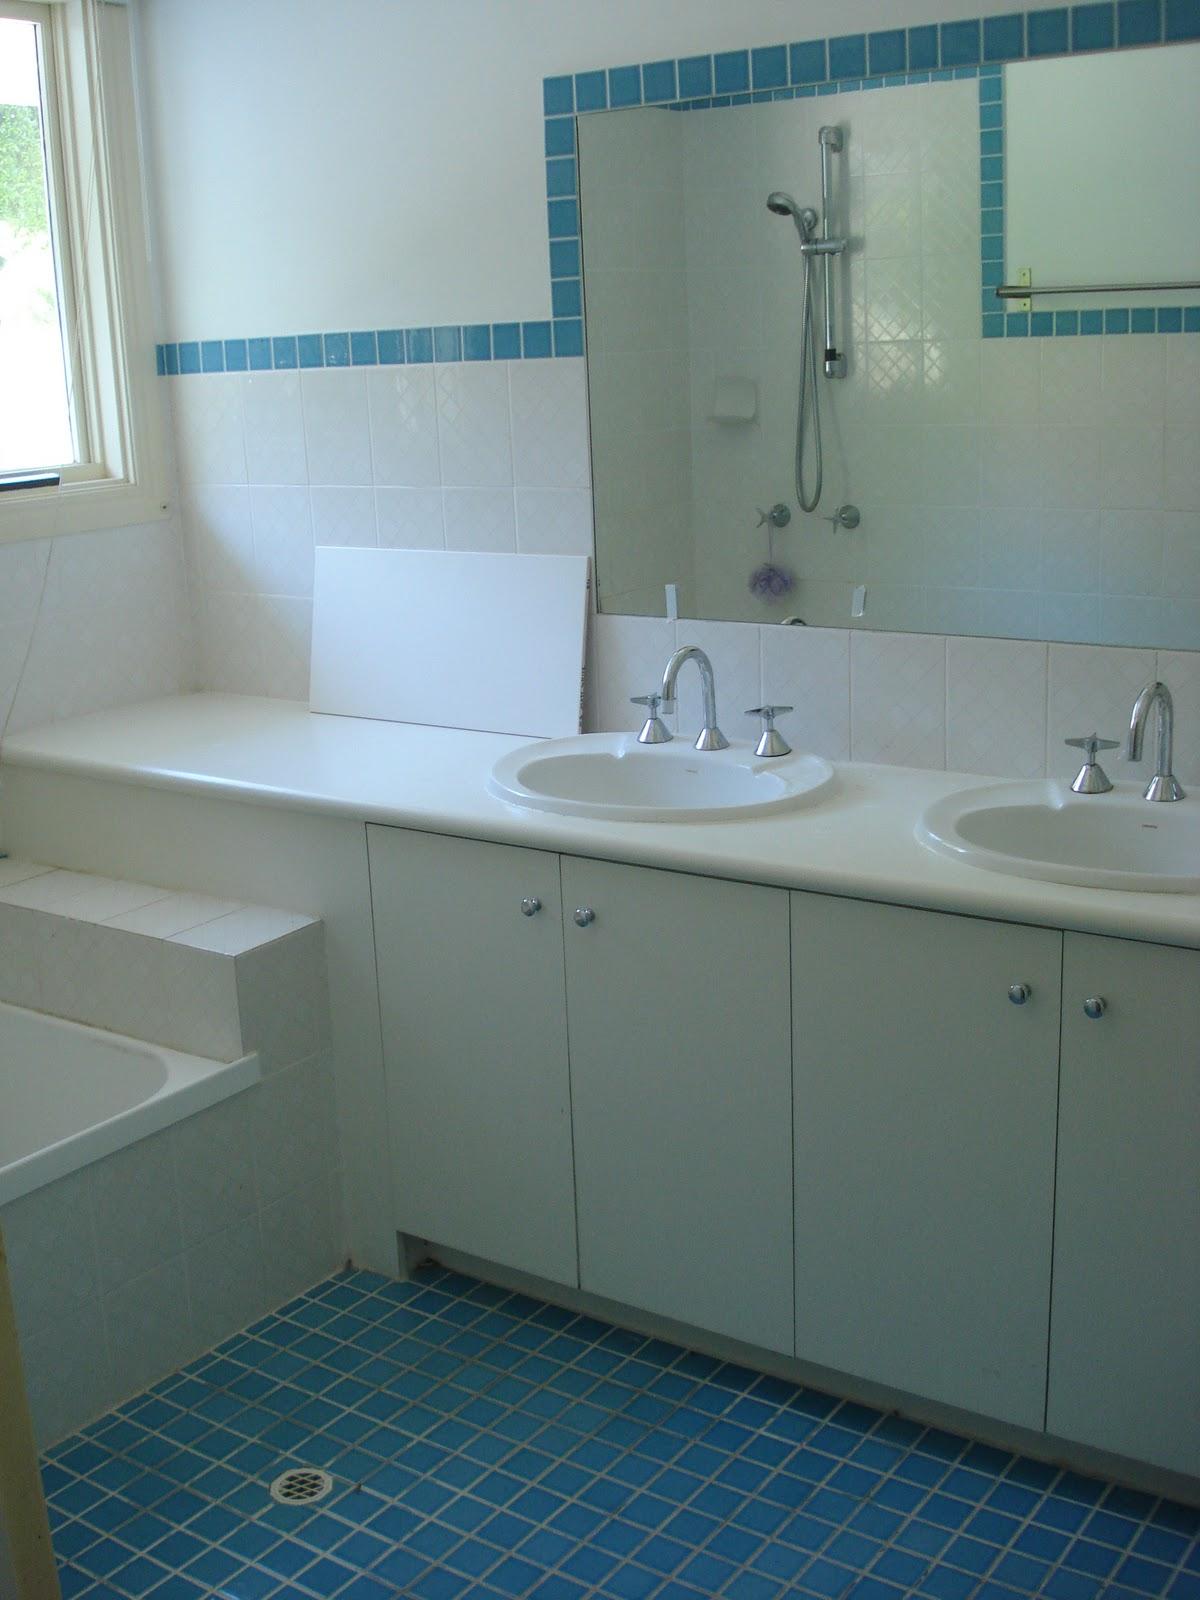 A Welsh girl in Australia: Bathroom renovations